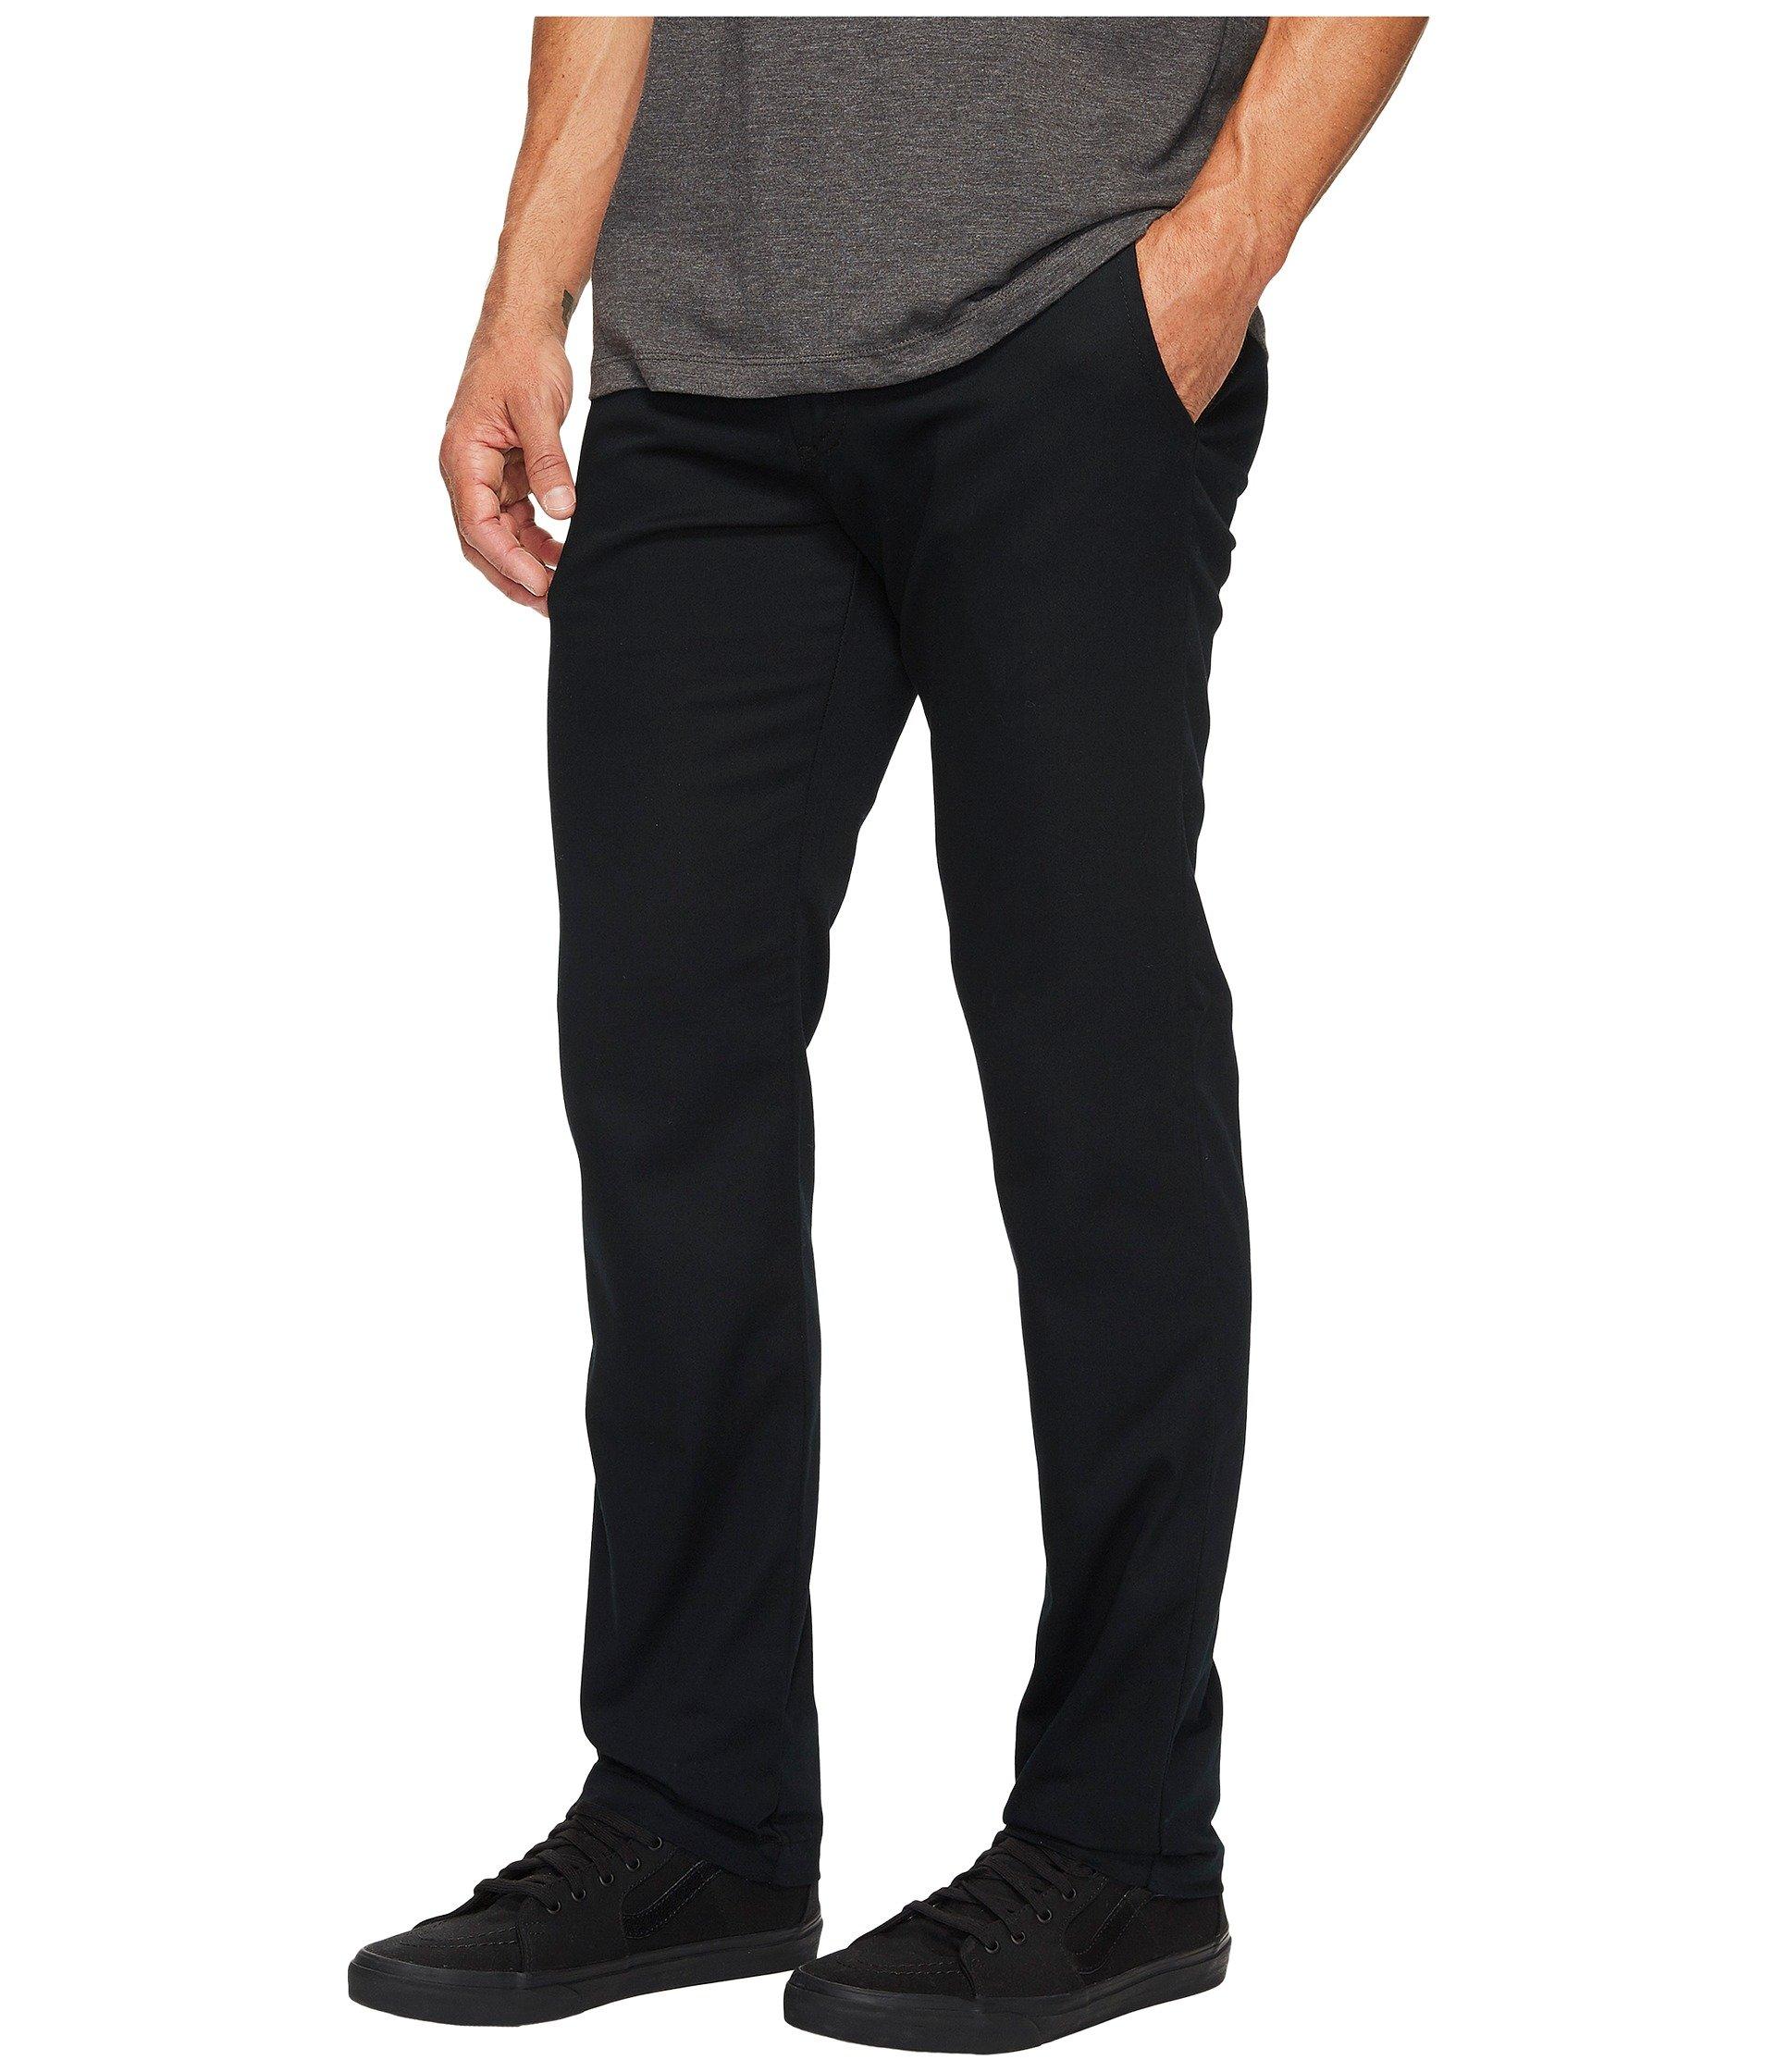 Chino Vans Stretch Pants Authentic Black g1EqYxw